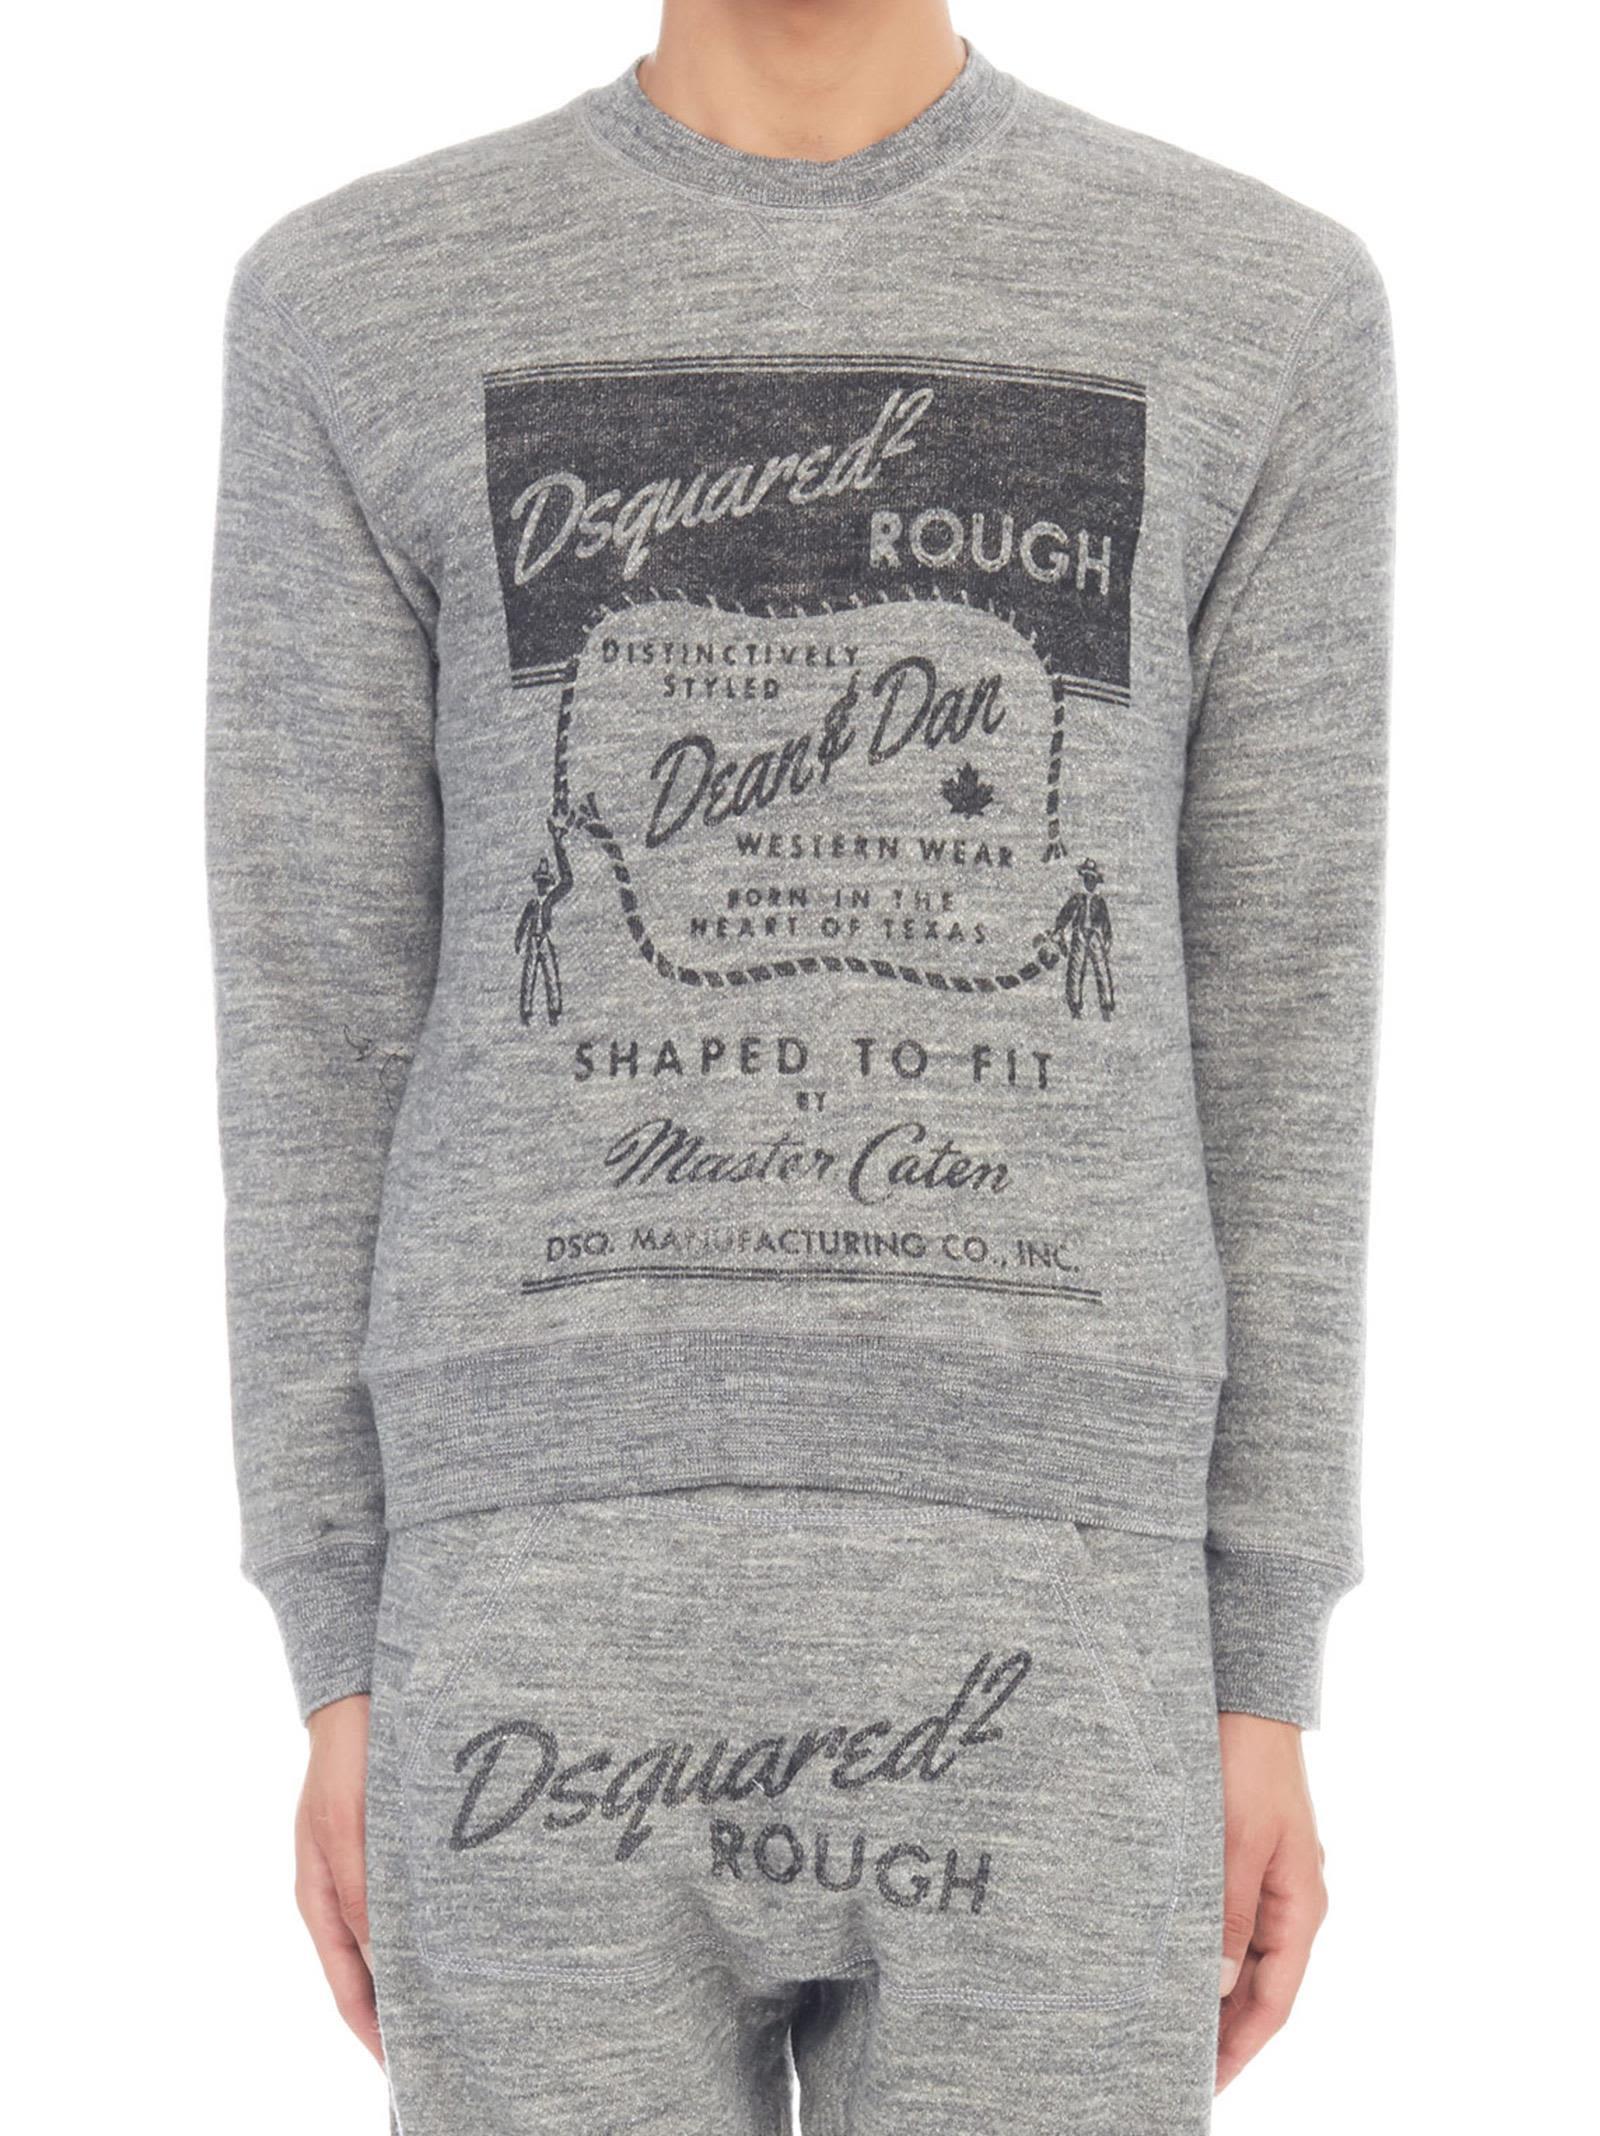 Dsquared2 'rough' Sweatshirt